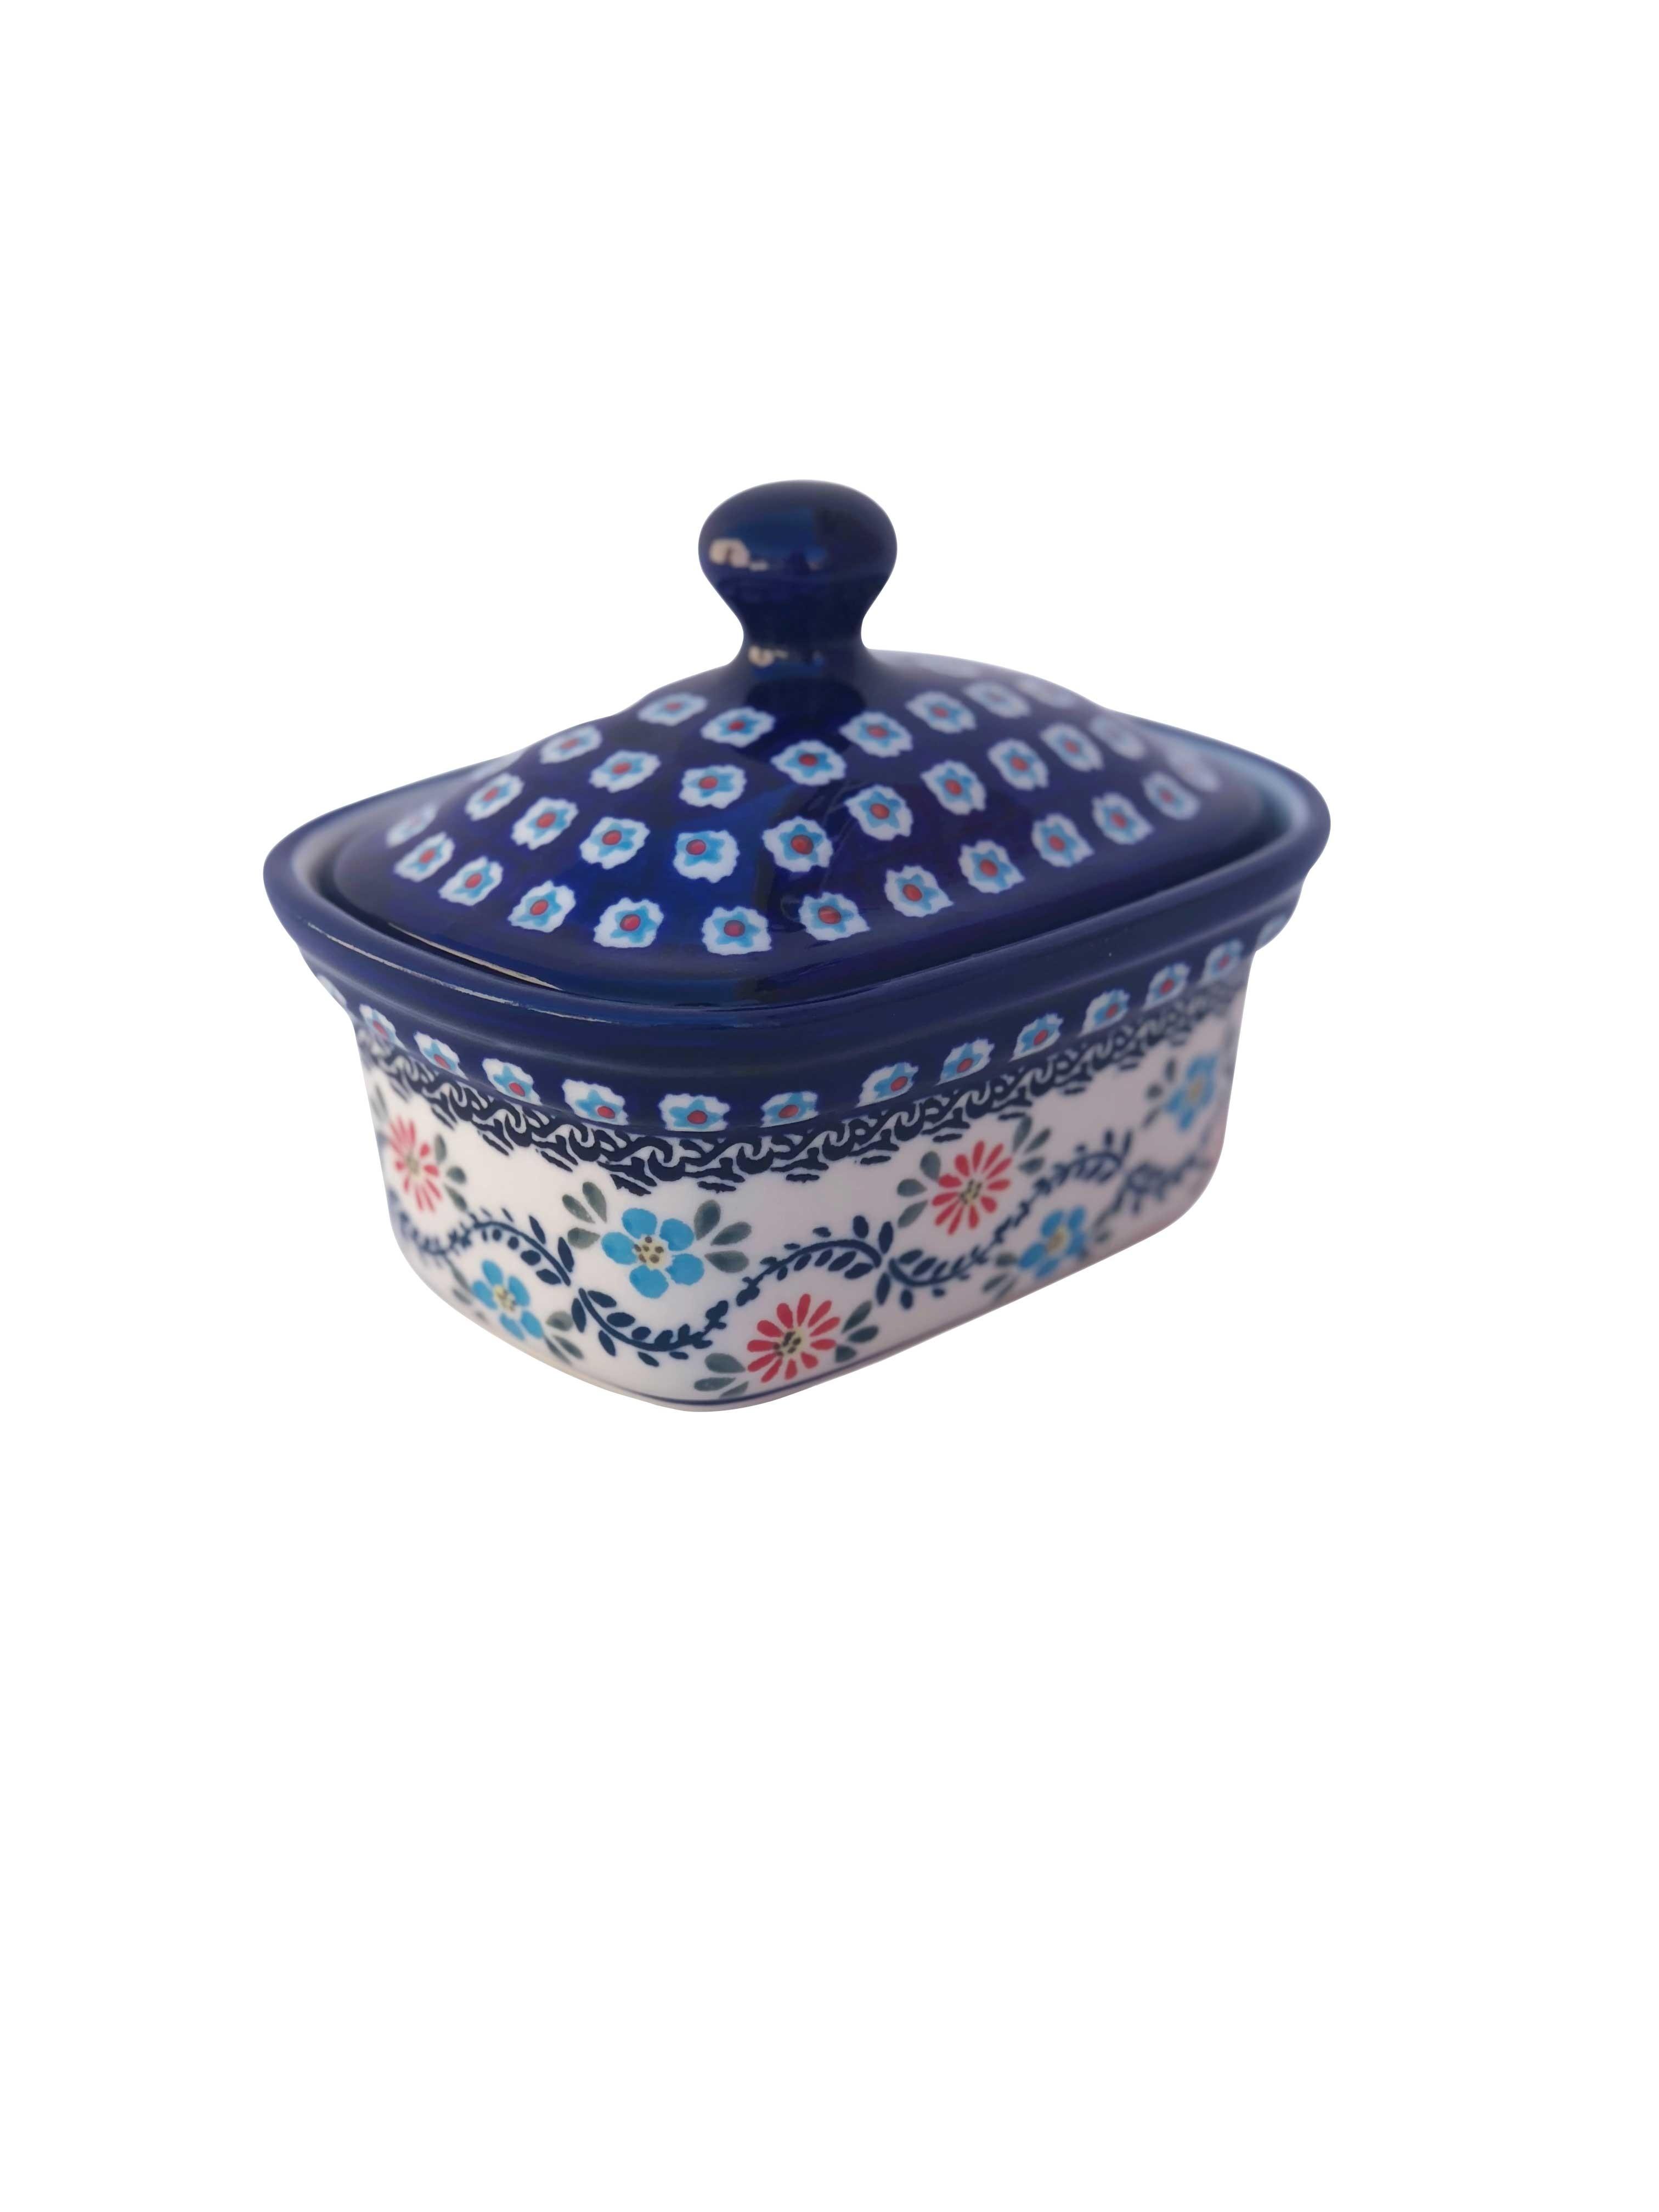 Pottery Avenue Heritage Home 2pc Stoneware Butter Box